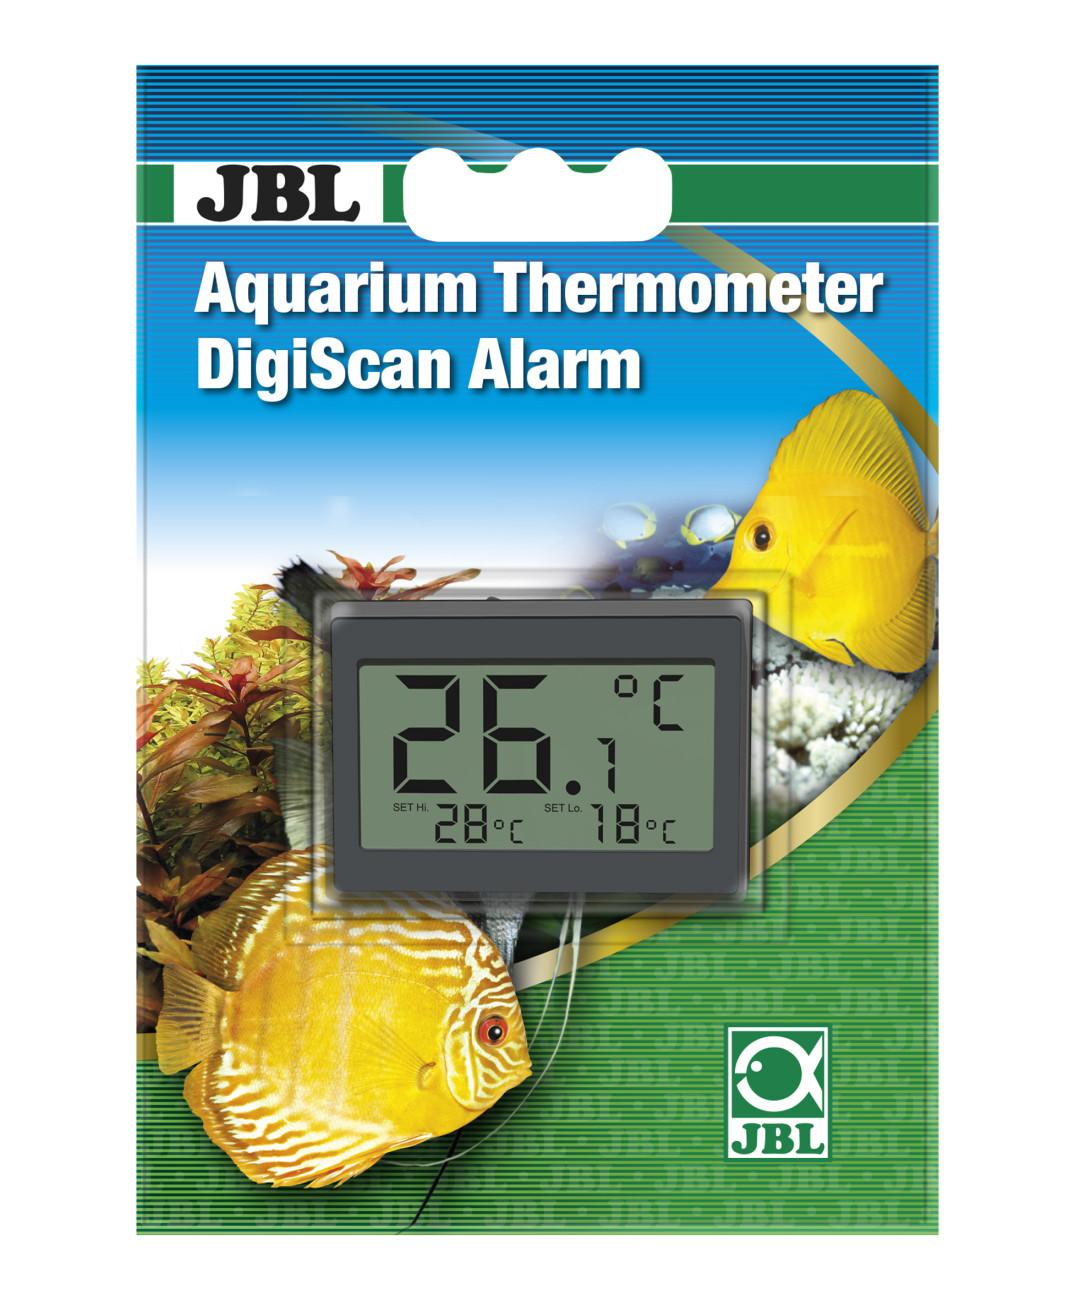 JBL thermometer DigiScan Alarm